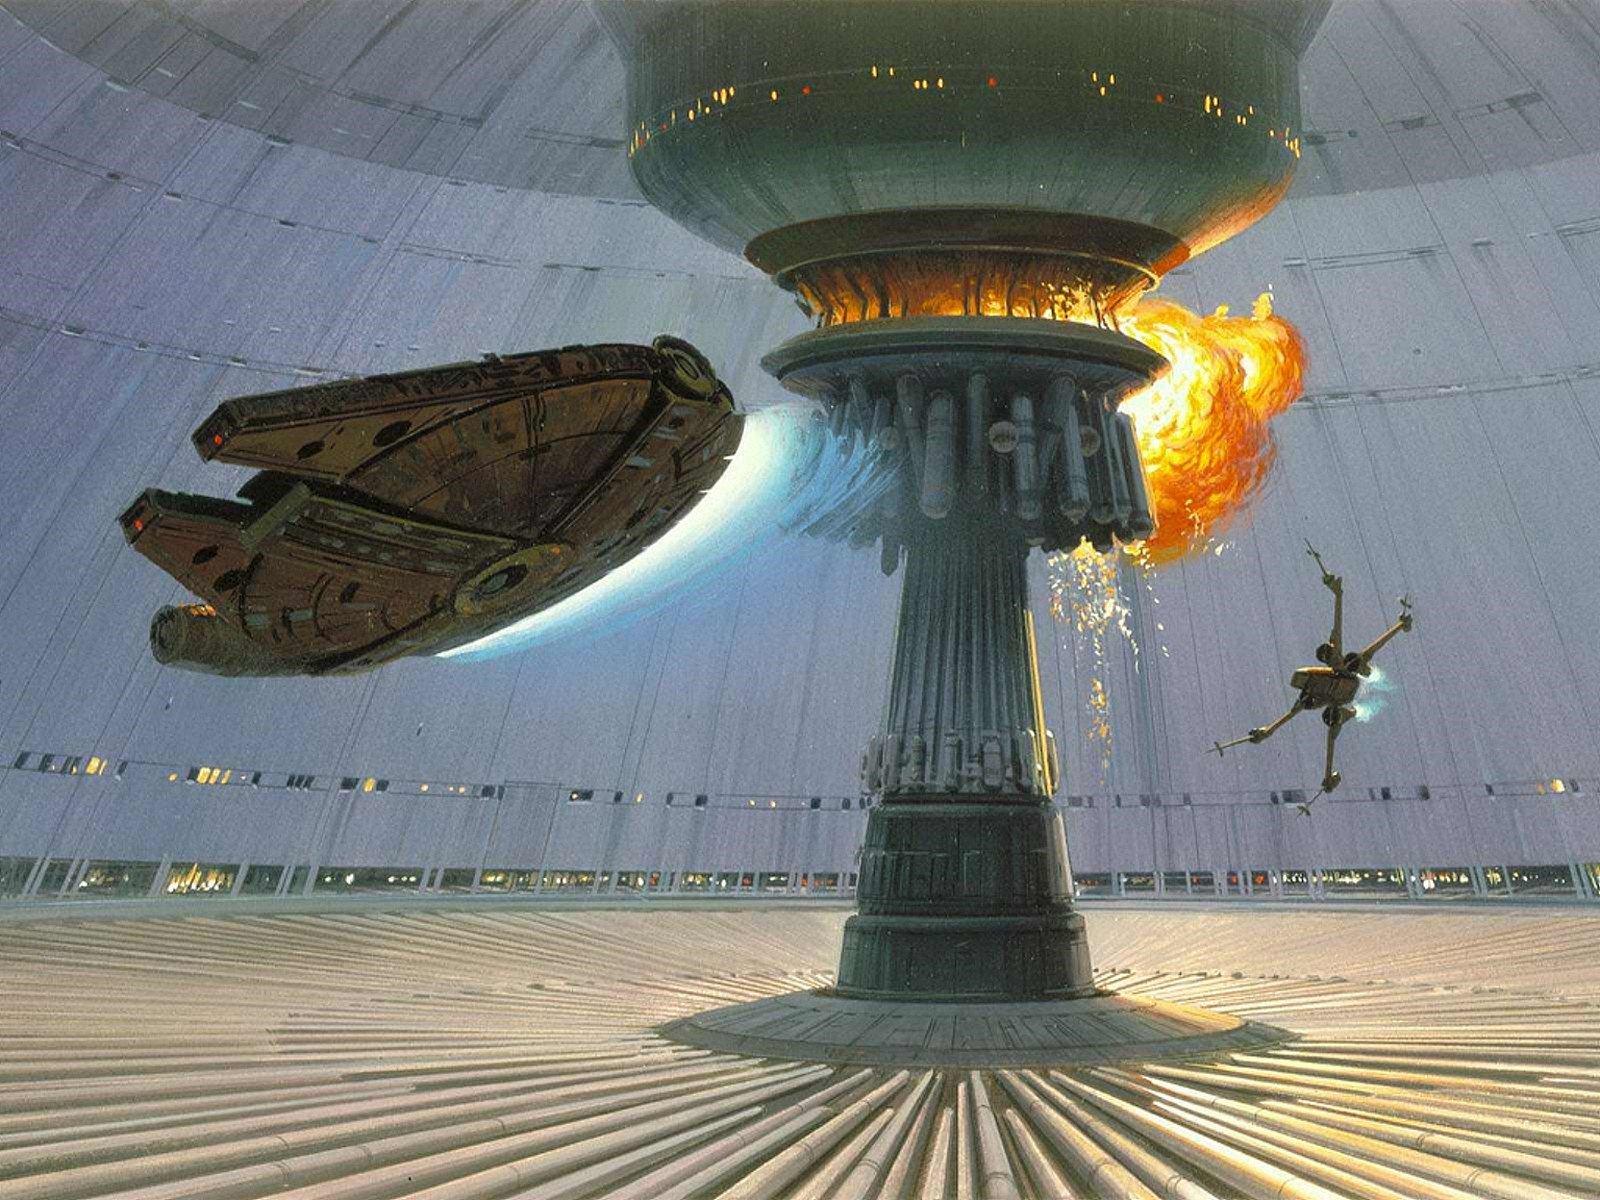 Star Wars Explosions Death Star Millennium Falcon X Wing Concept Art